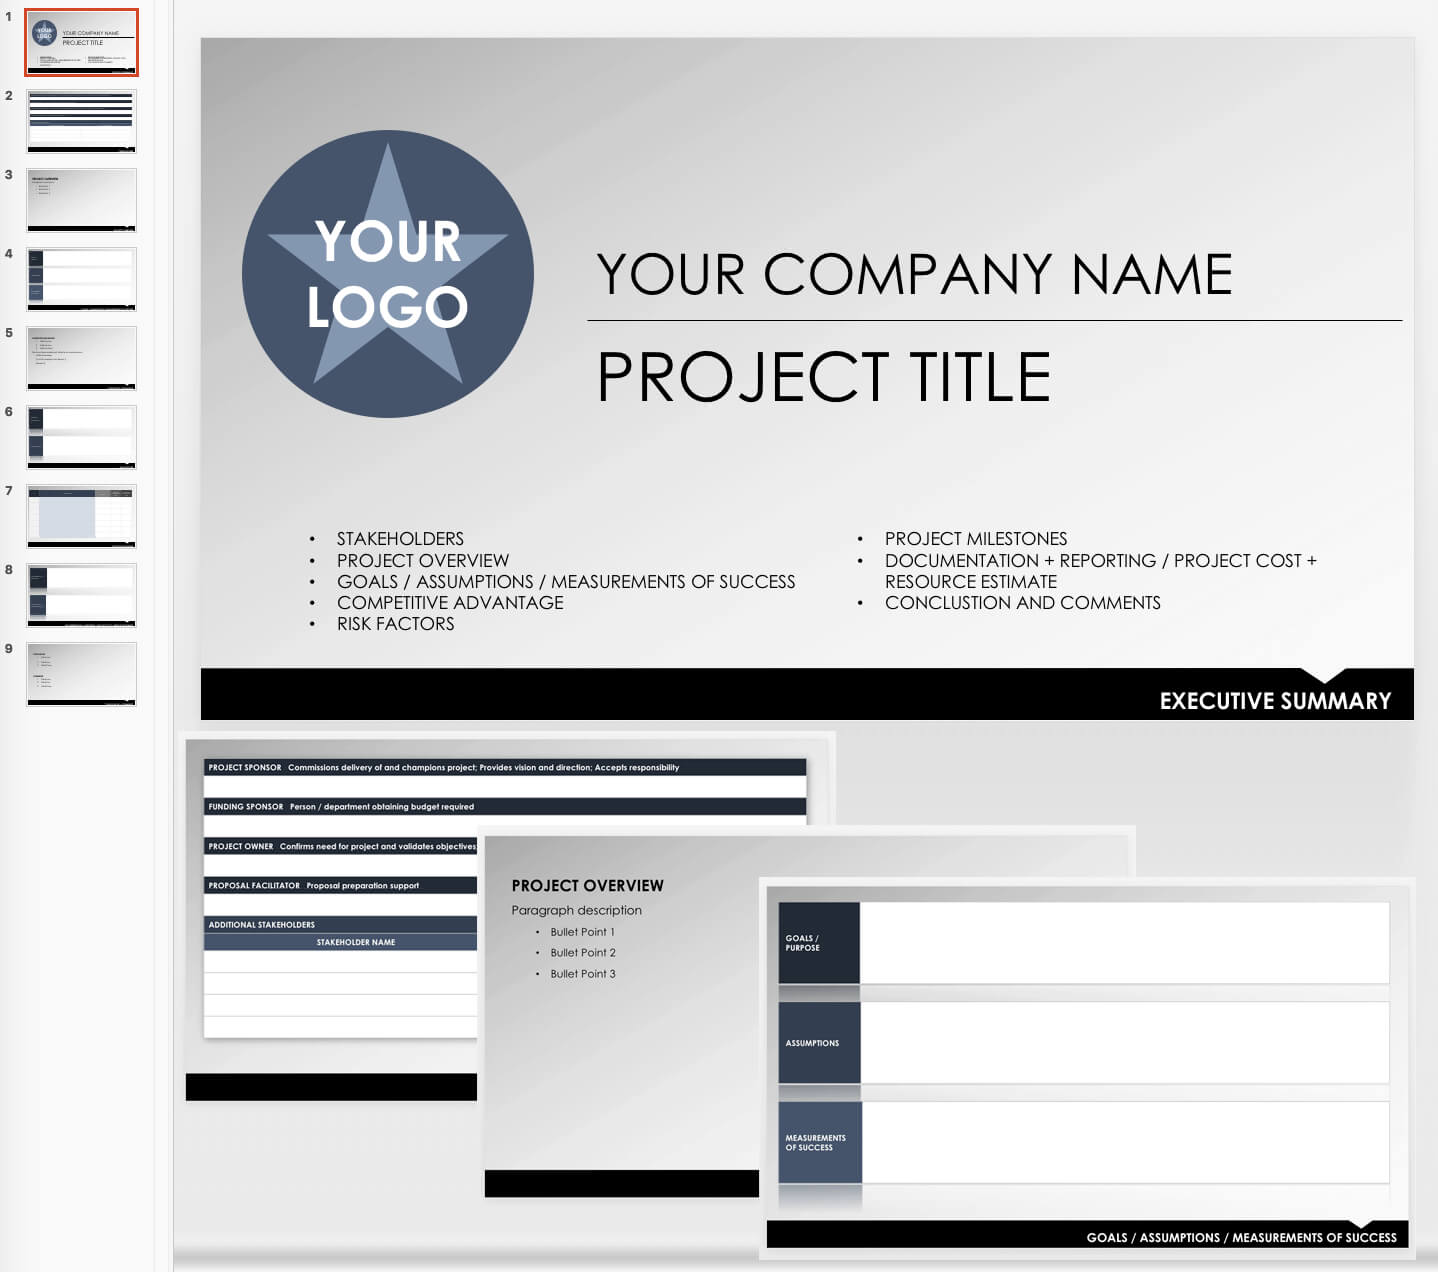 Free Executive Summary Templates | Smartsheet With Executive Summary Report Template